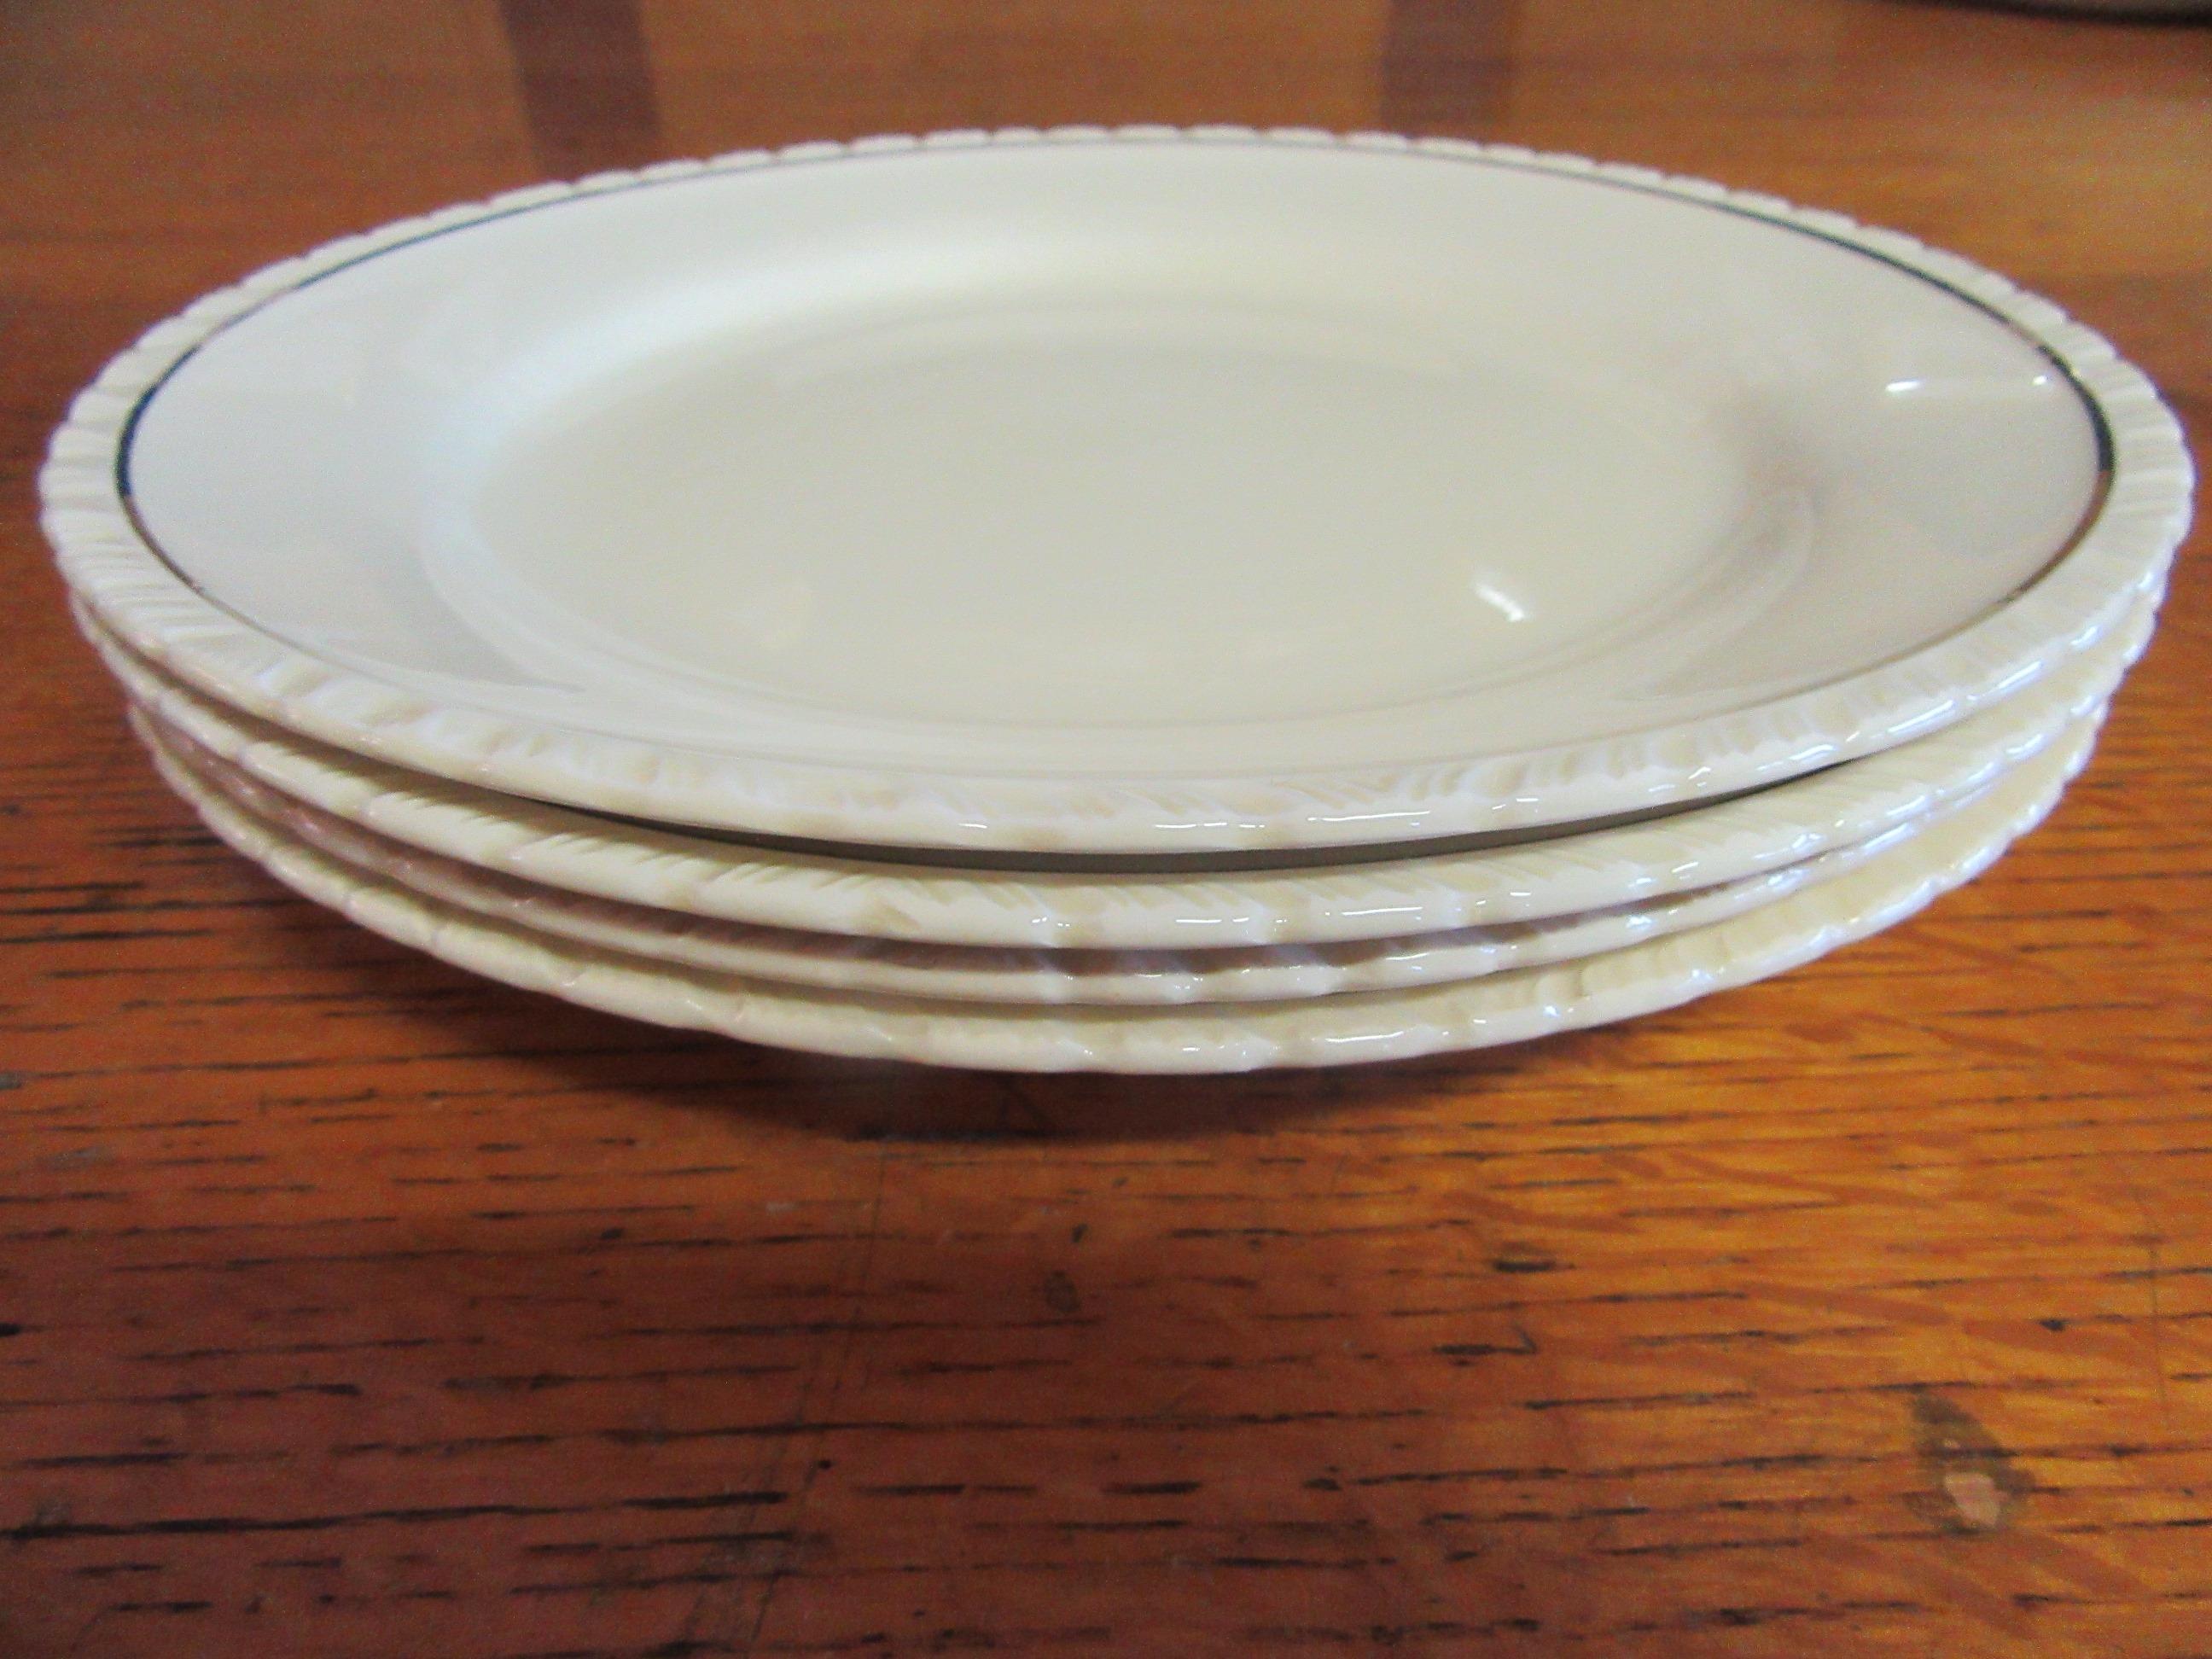 New Hall Dinner Plates